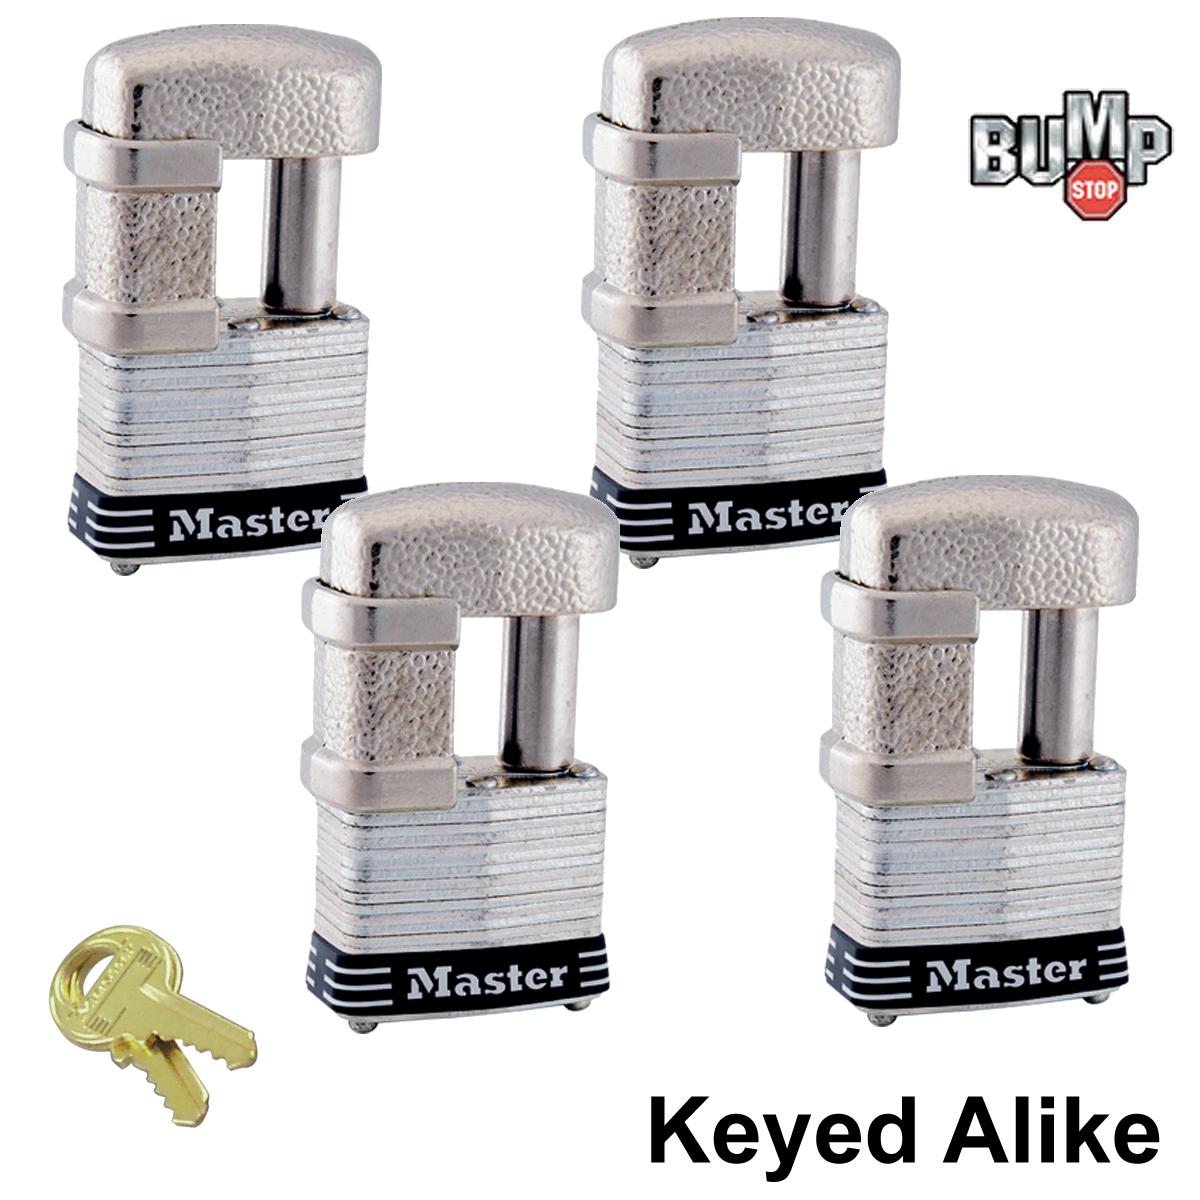 Master Lock - (4) Keyed Alike Trailer & Multi Purpose Padlocks #37NKA-4 BUMP